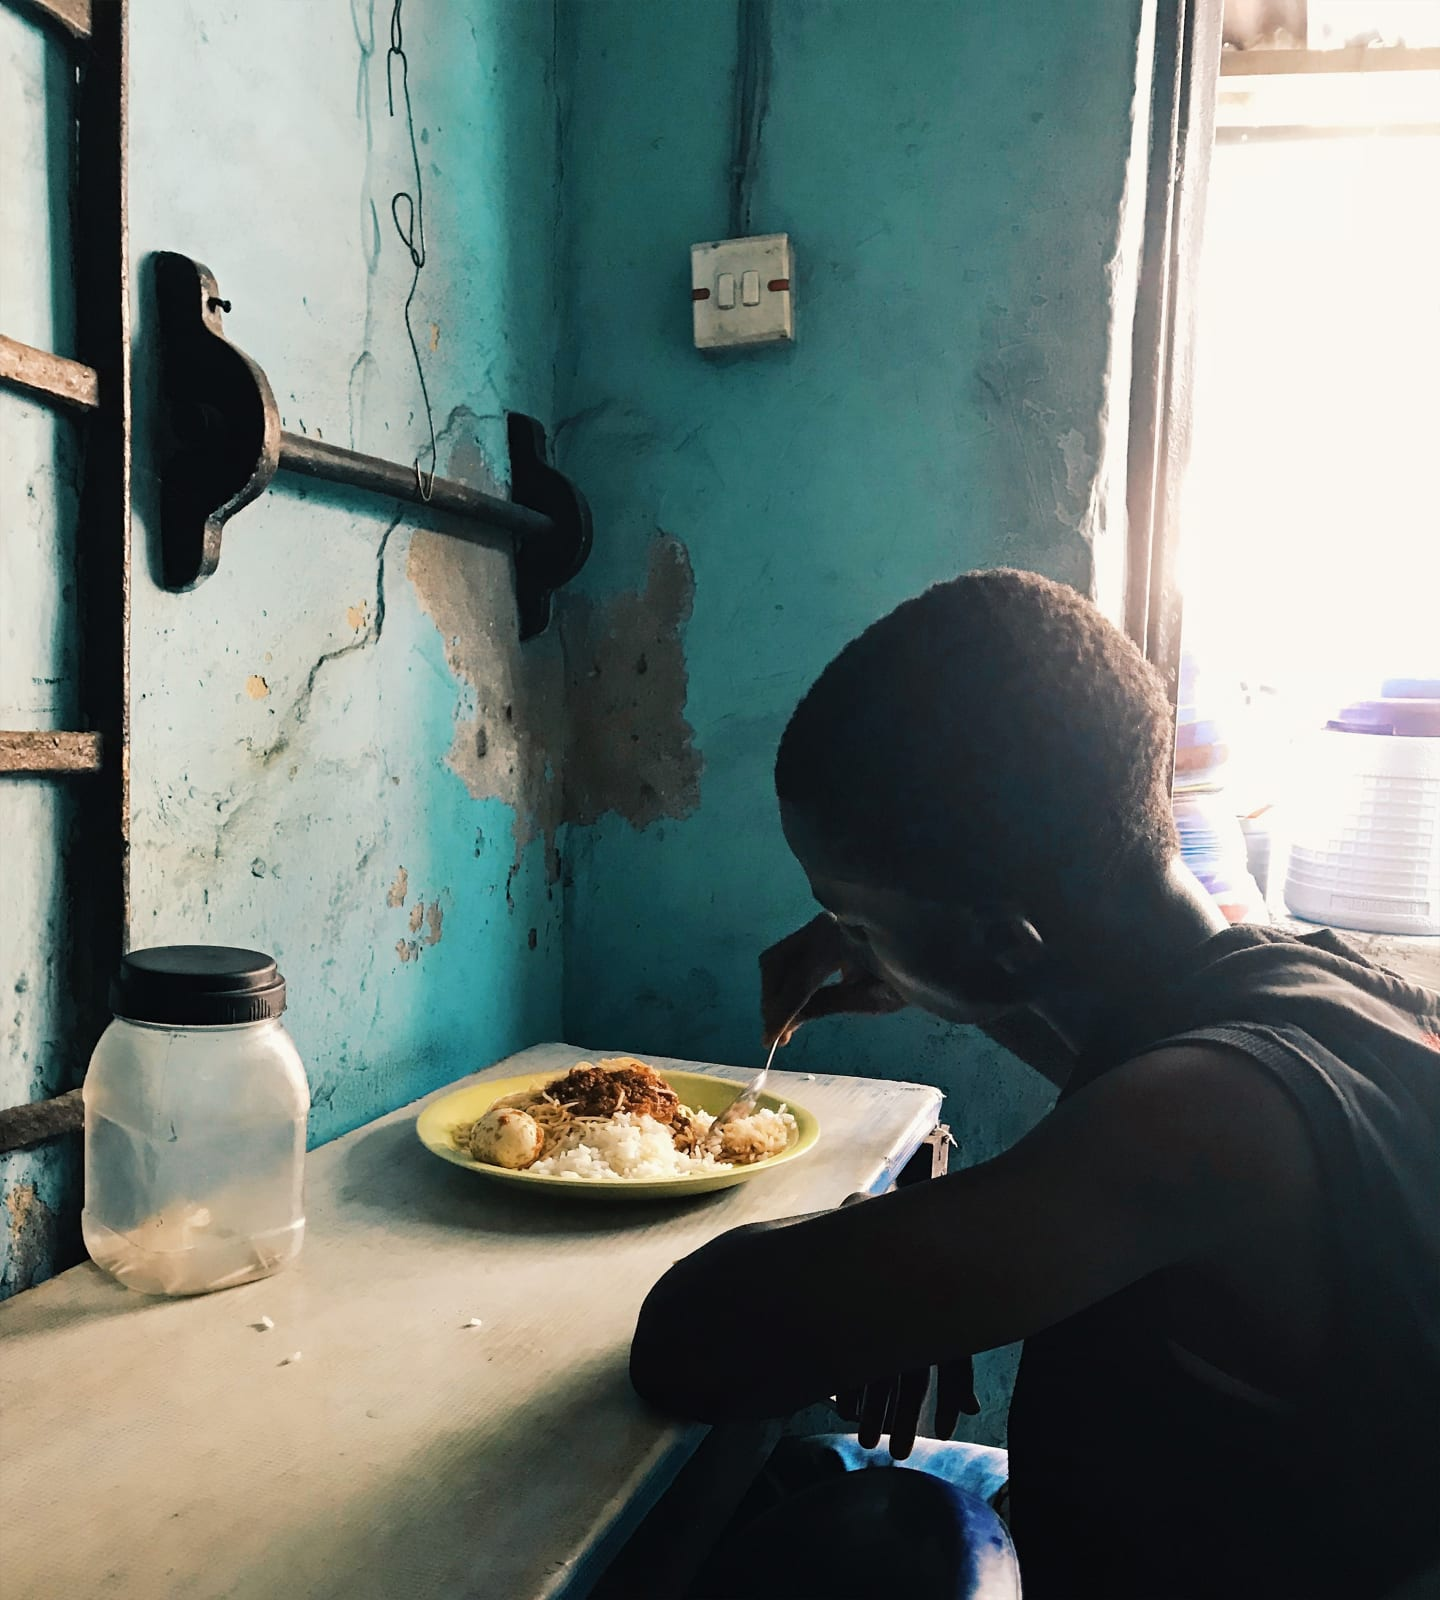 Arinzechukwu Patrick A boy enjoys his meal in a small restaurant 25.2 x 28 cm 19 x 21 cm Digital print